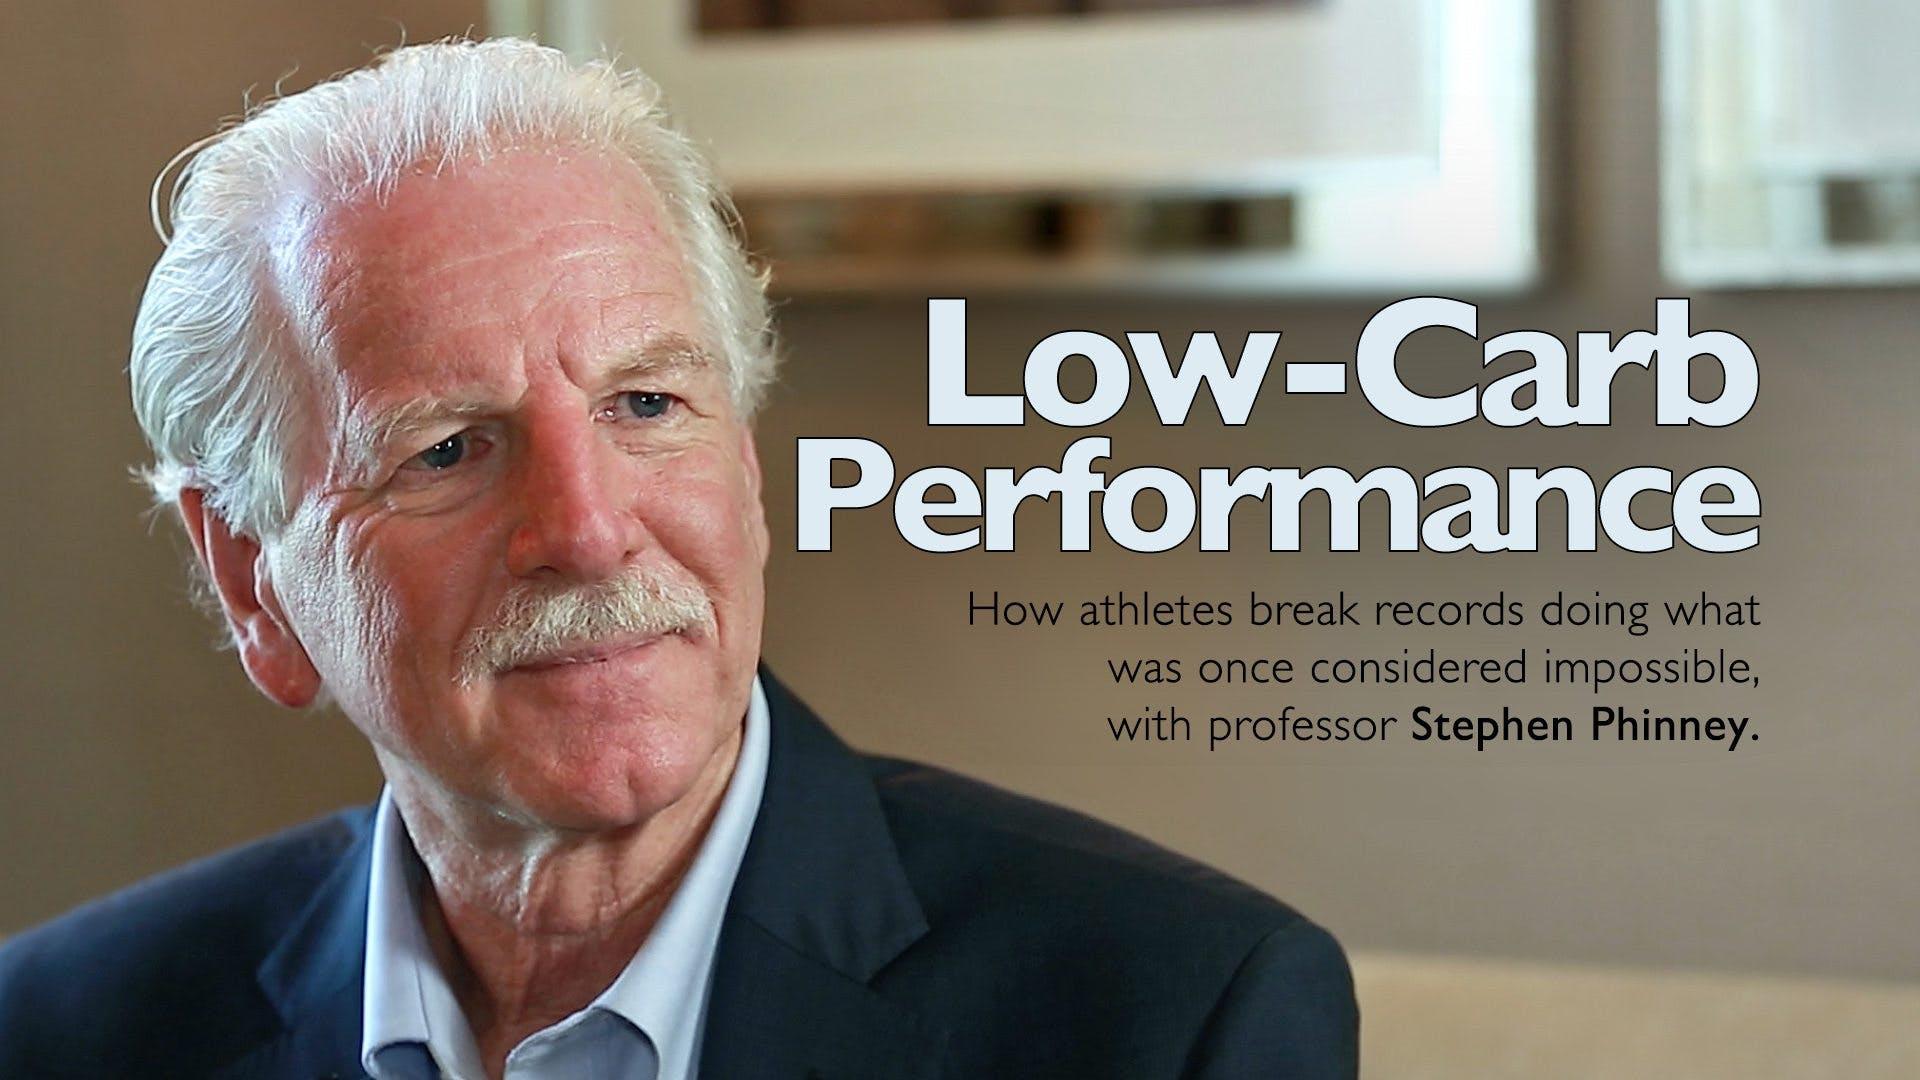 Low-Carb Performance – Professor Stephen Phinney